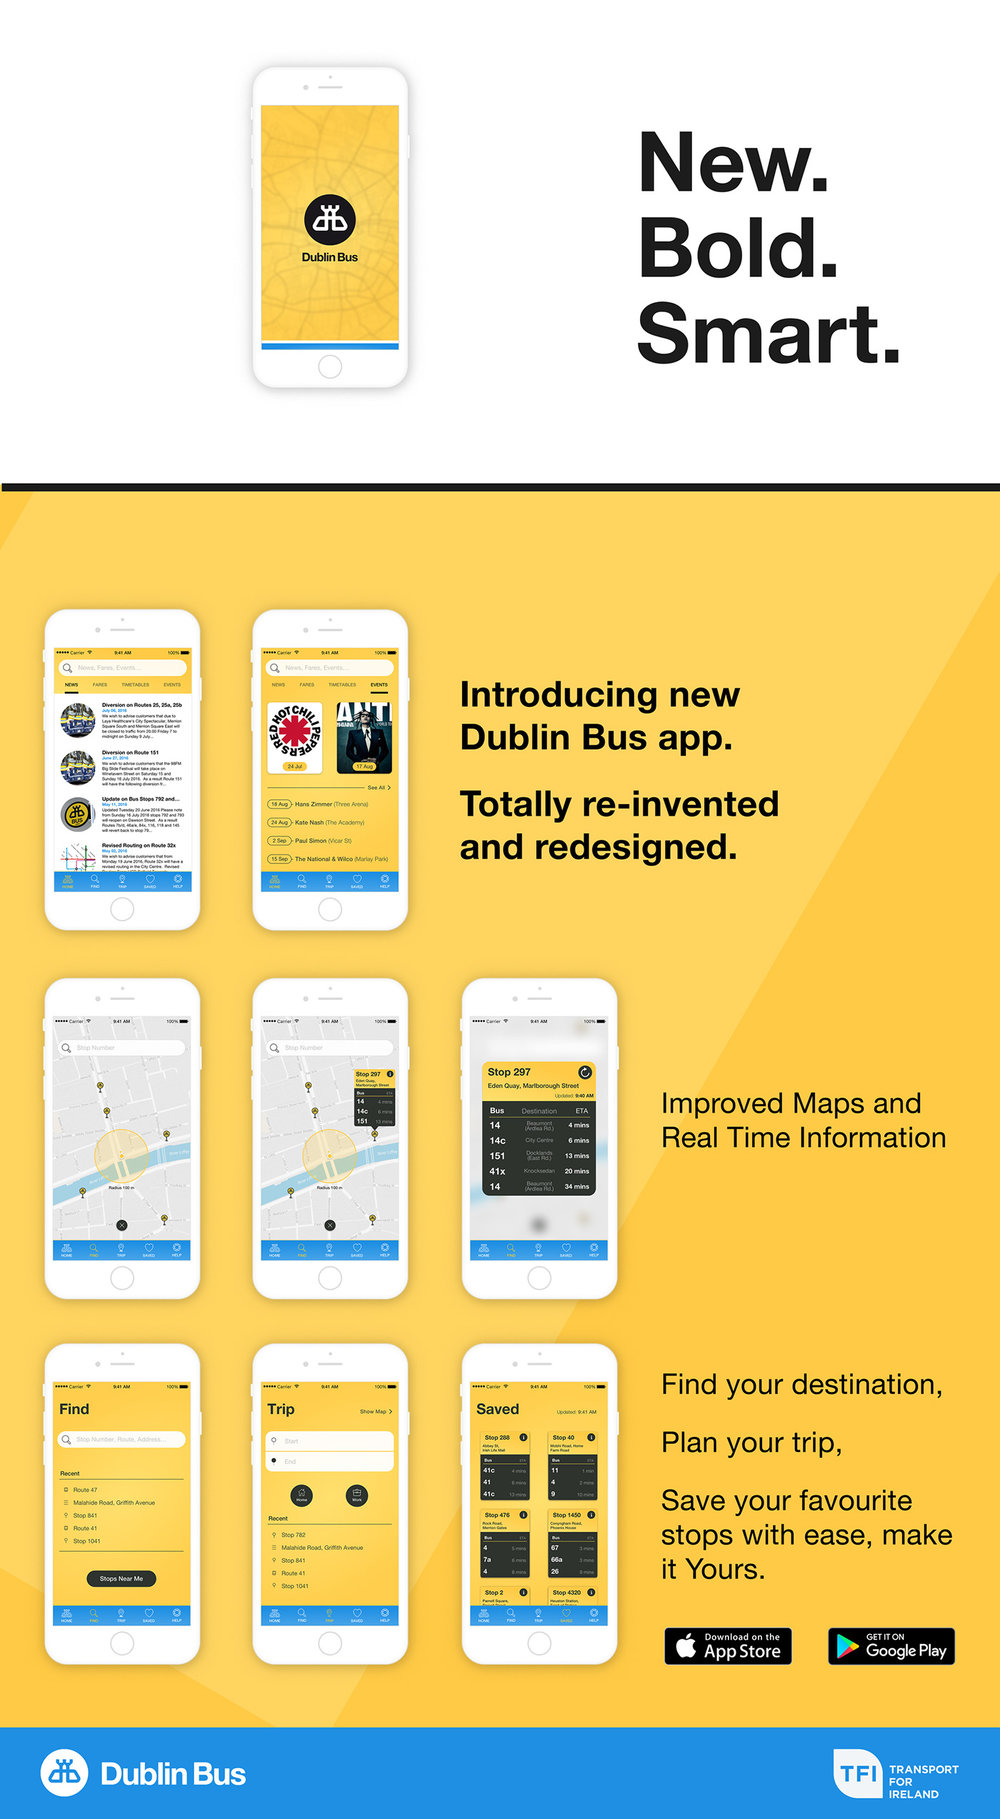 dublin_bus2.jpg